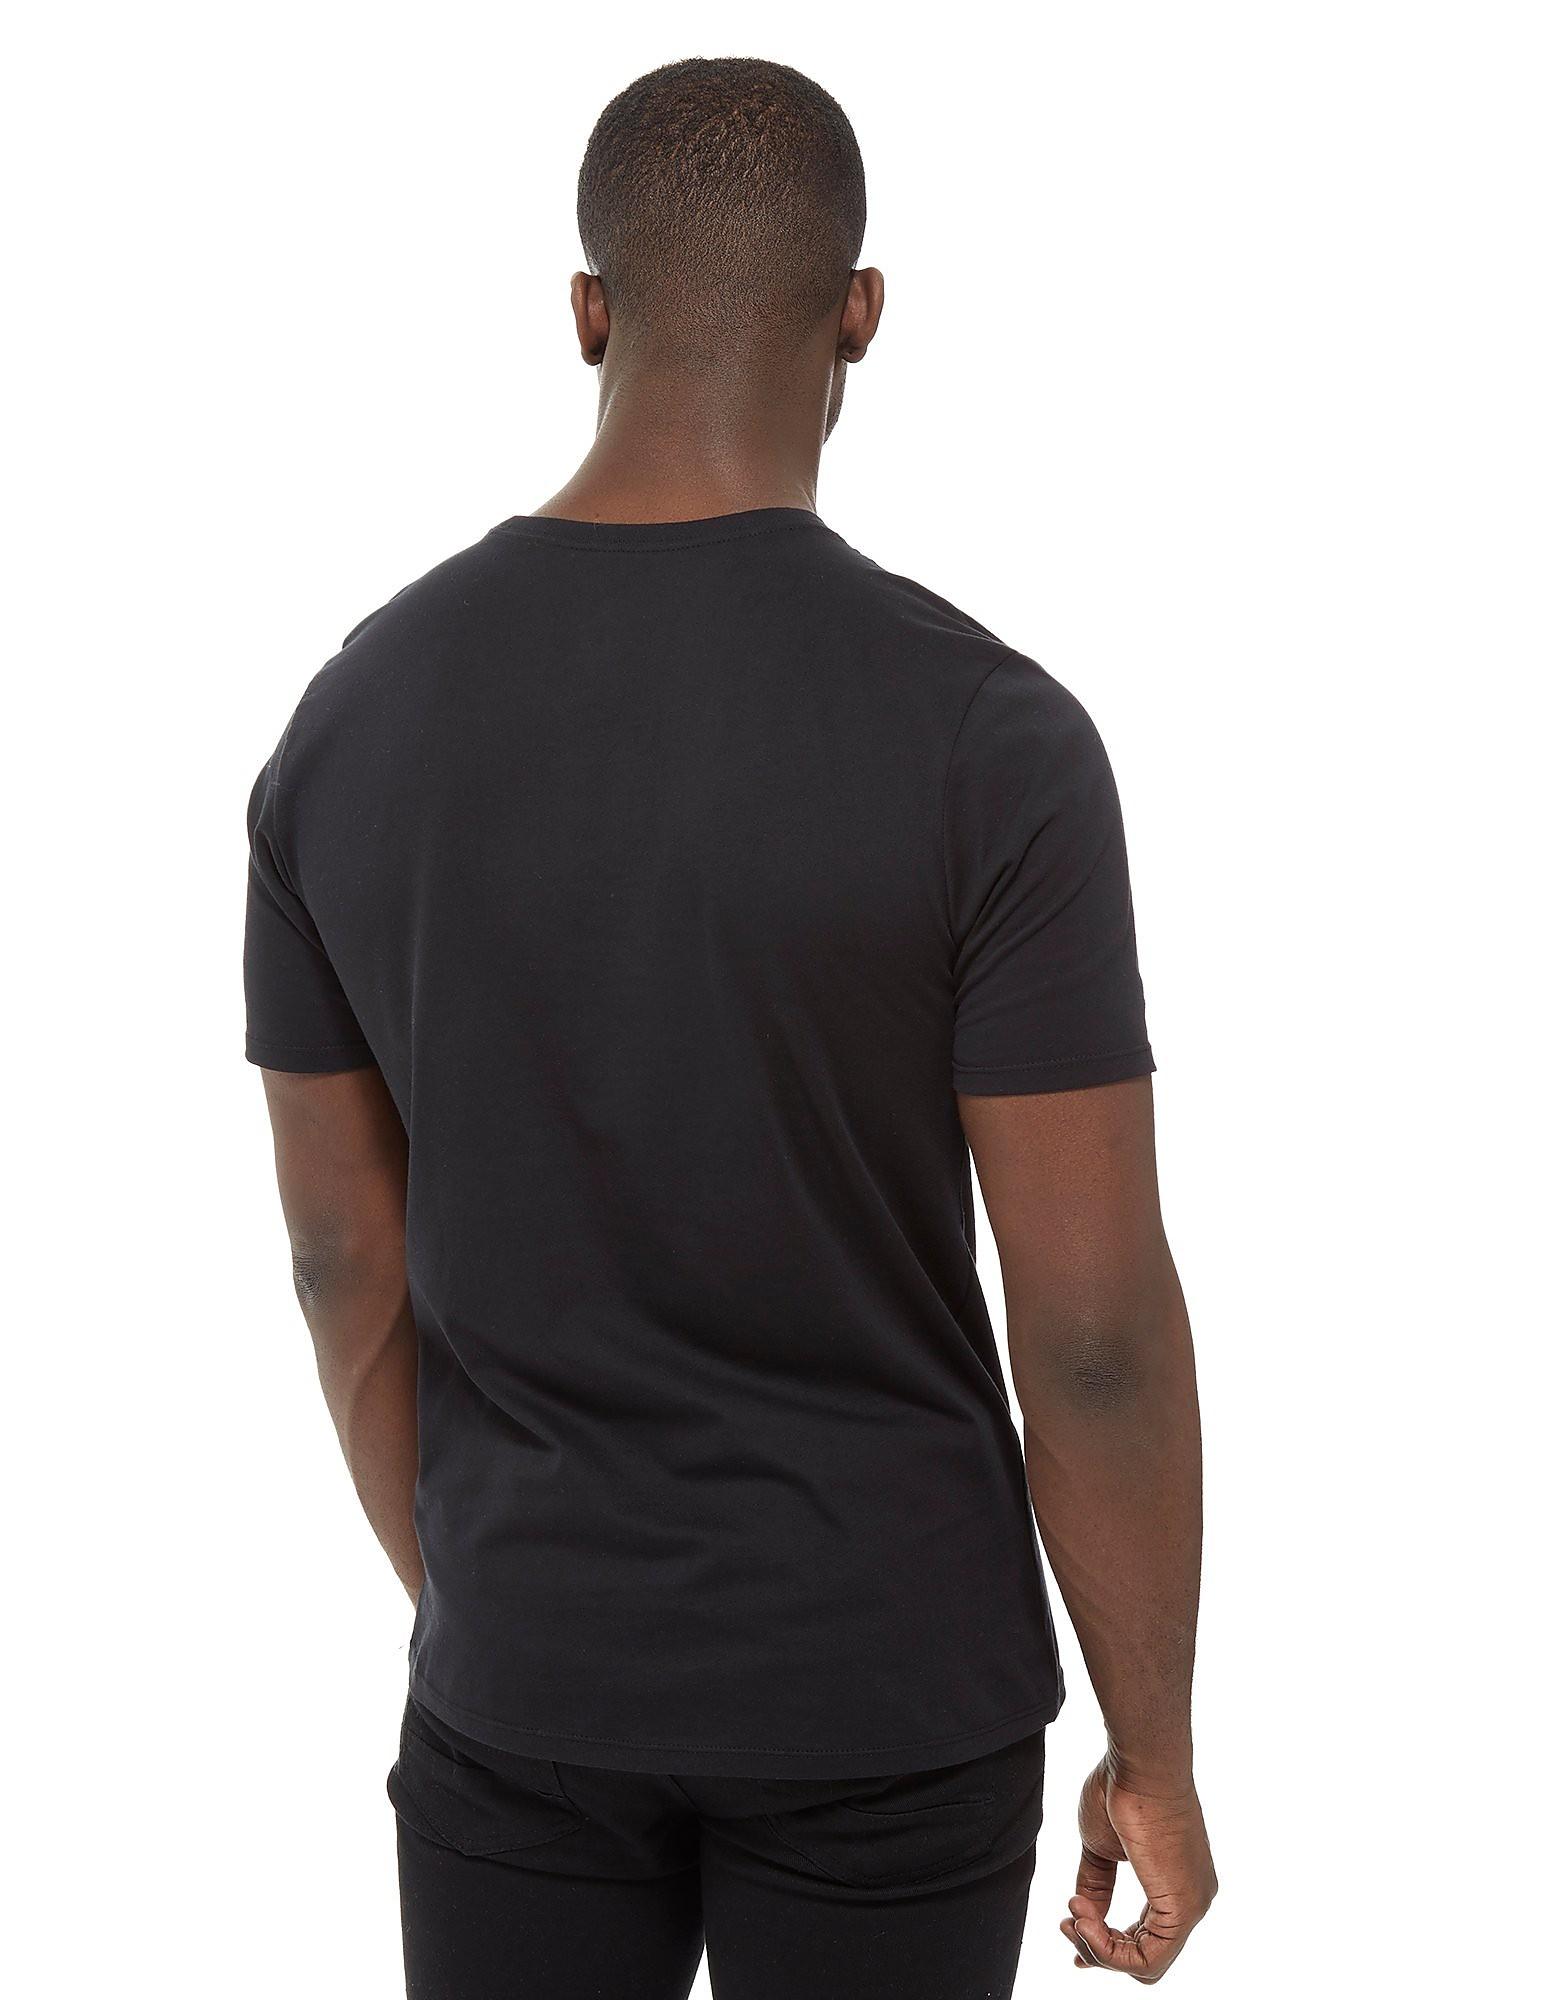 Jordan Elephant Print Jumpman T-Shirt